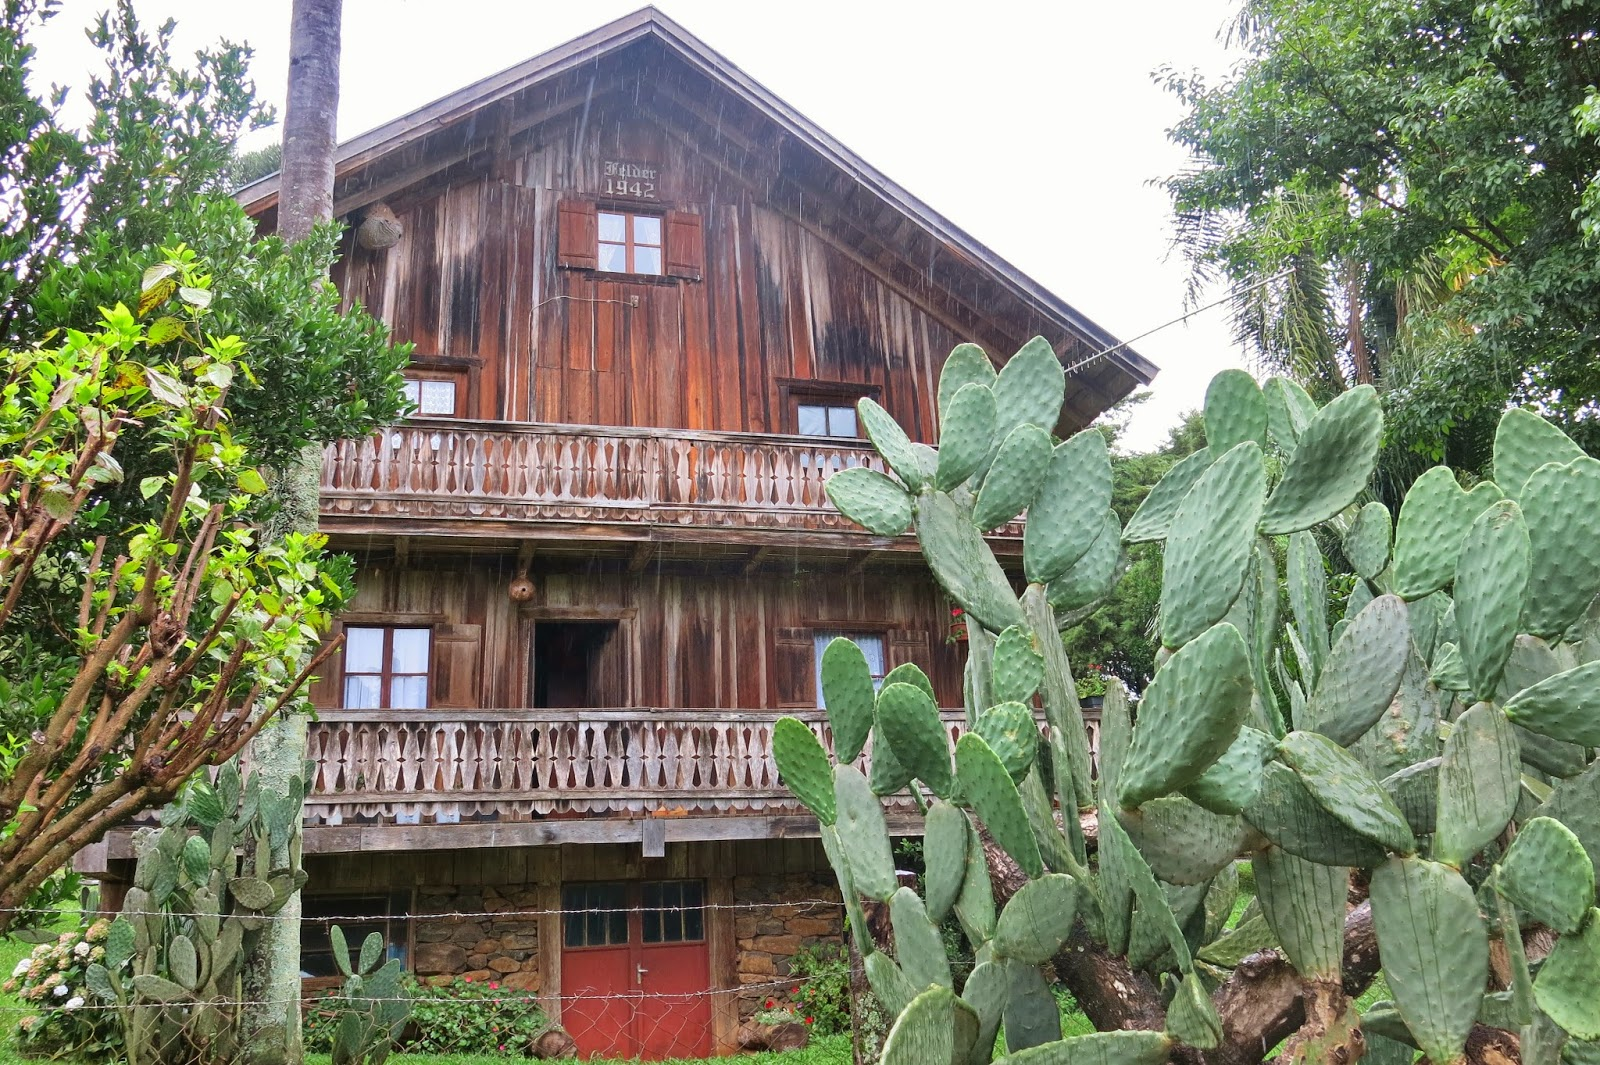 Casa mais antiga do tirol brasileiro